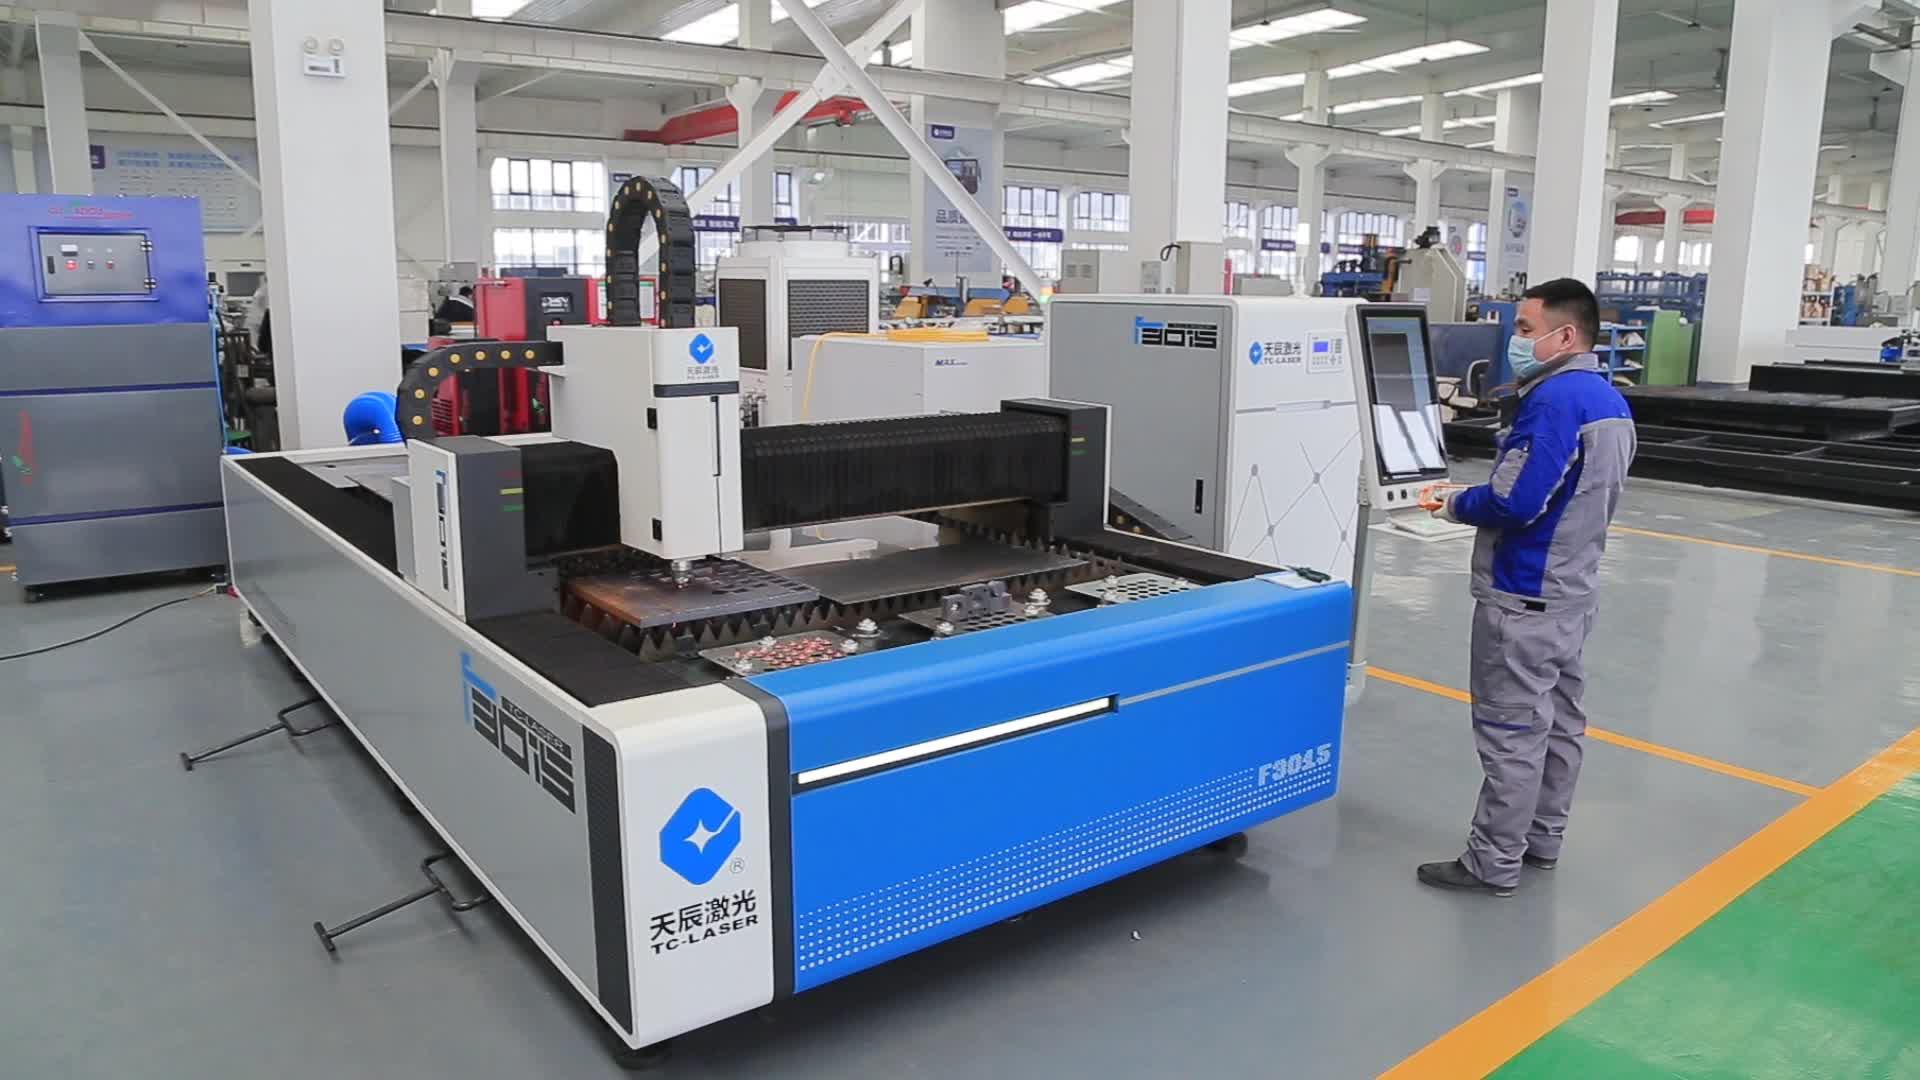 CNC Çift Çalışma Masaları Profesyonel Metal Sac Işleme lazer kesme makinesi Model TC-F3015T